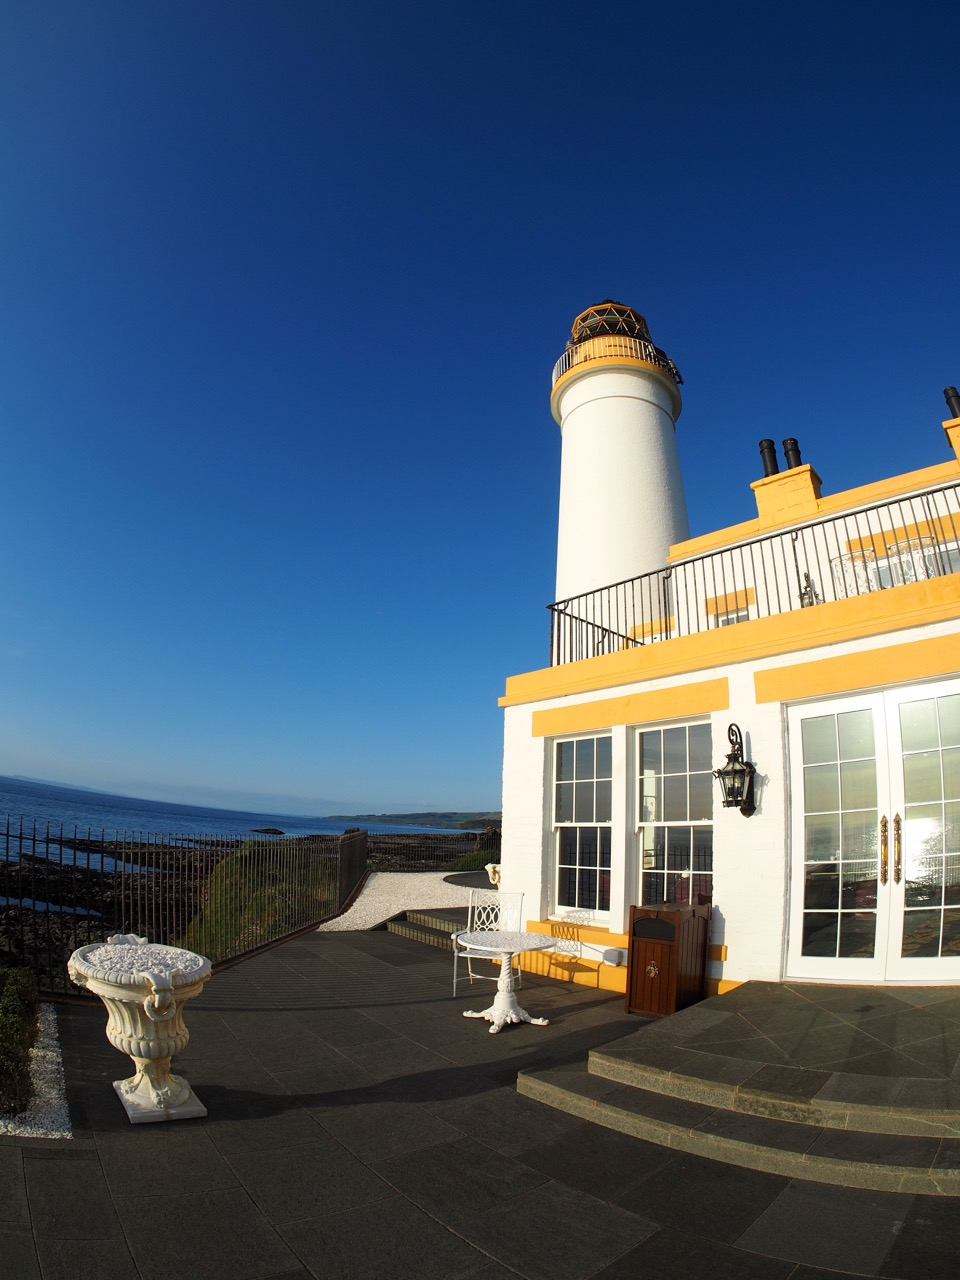 Le célèbre phare de Turnberry (halfway house)